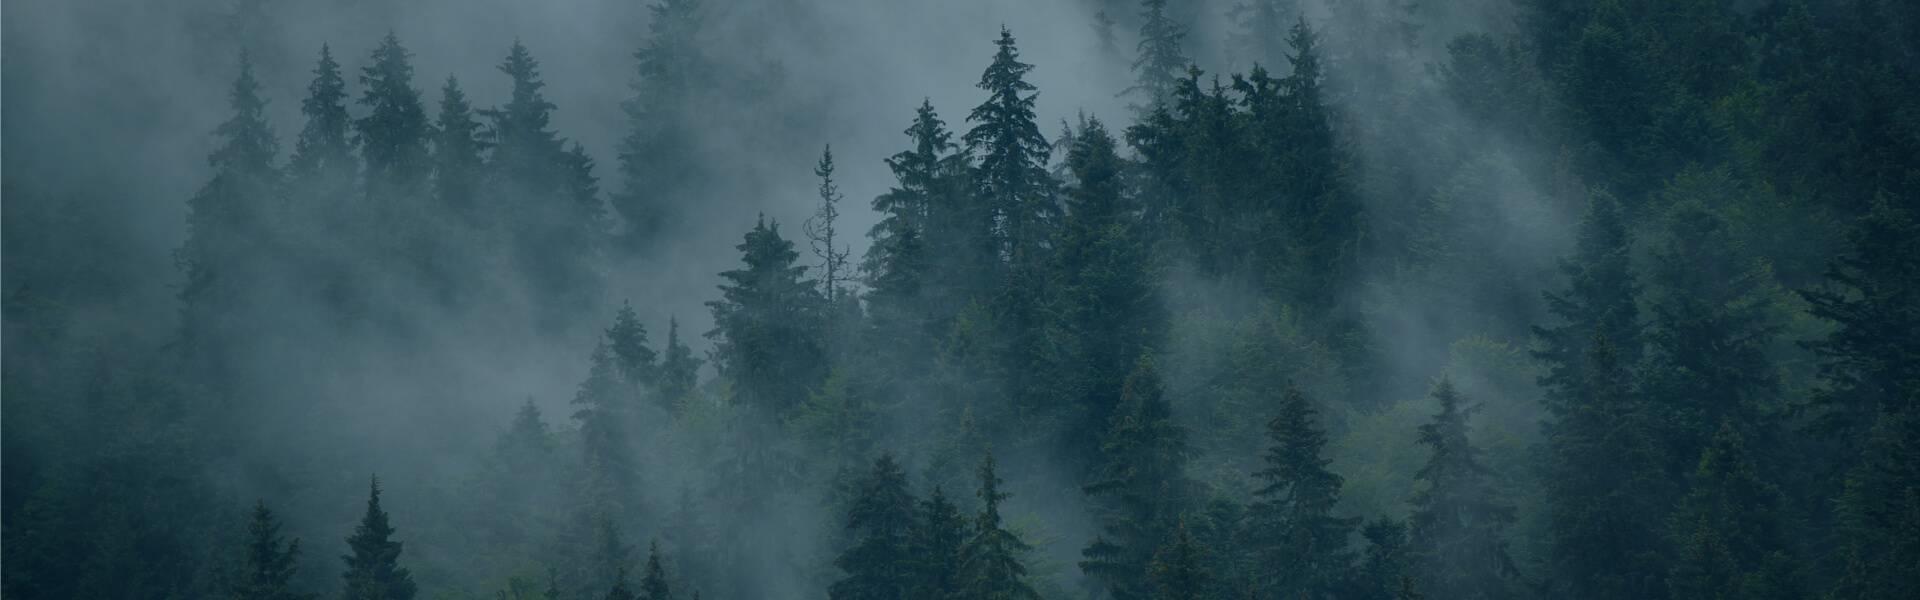 montagne brumeuse